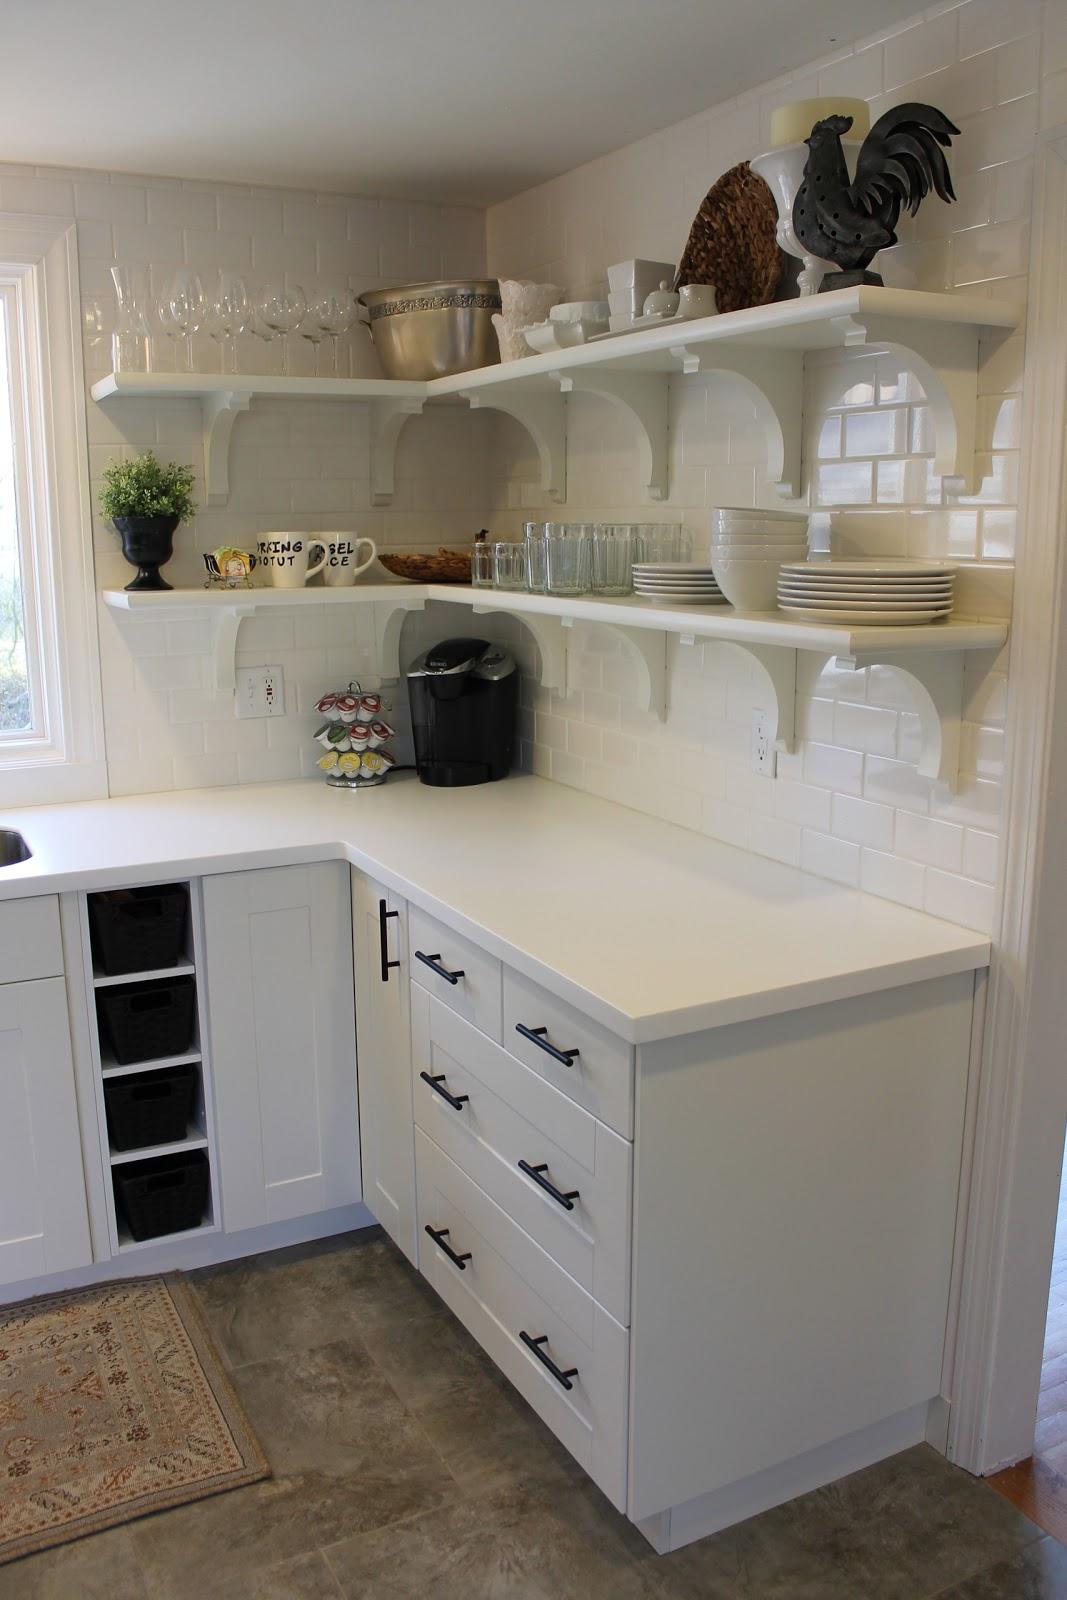 white corian kitchen countertops hood an excellent adventure source list